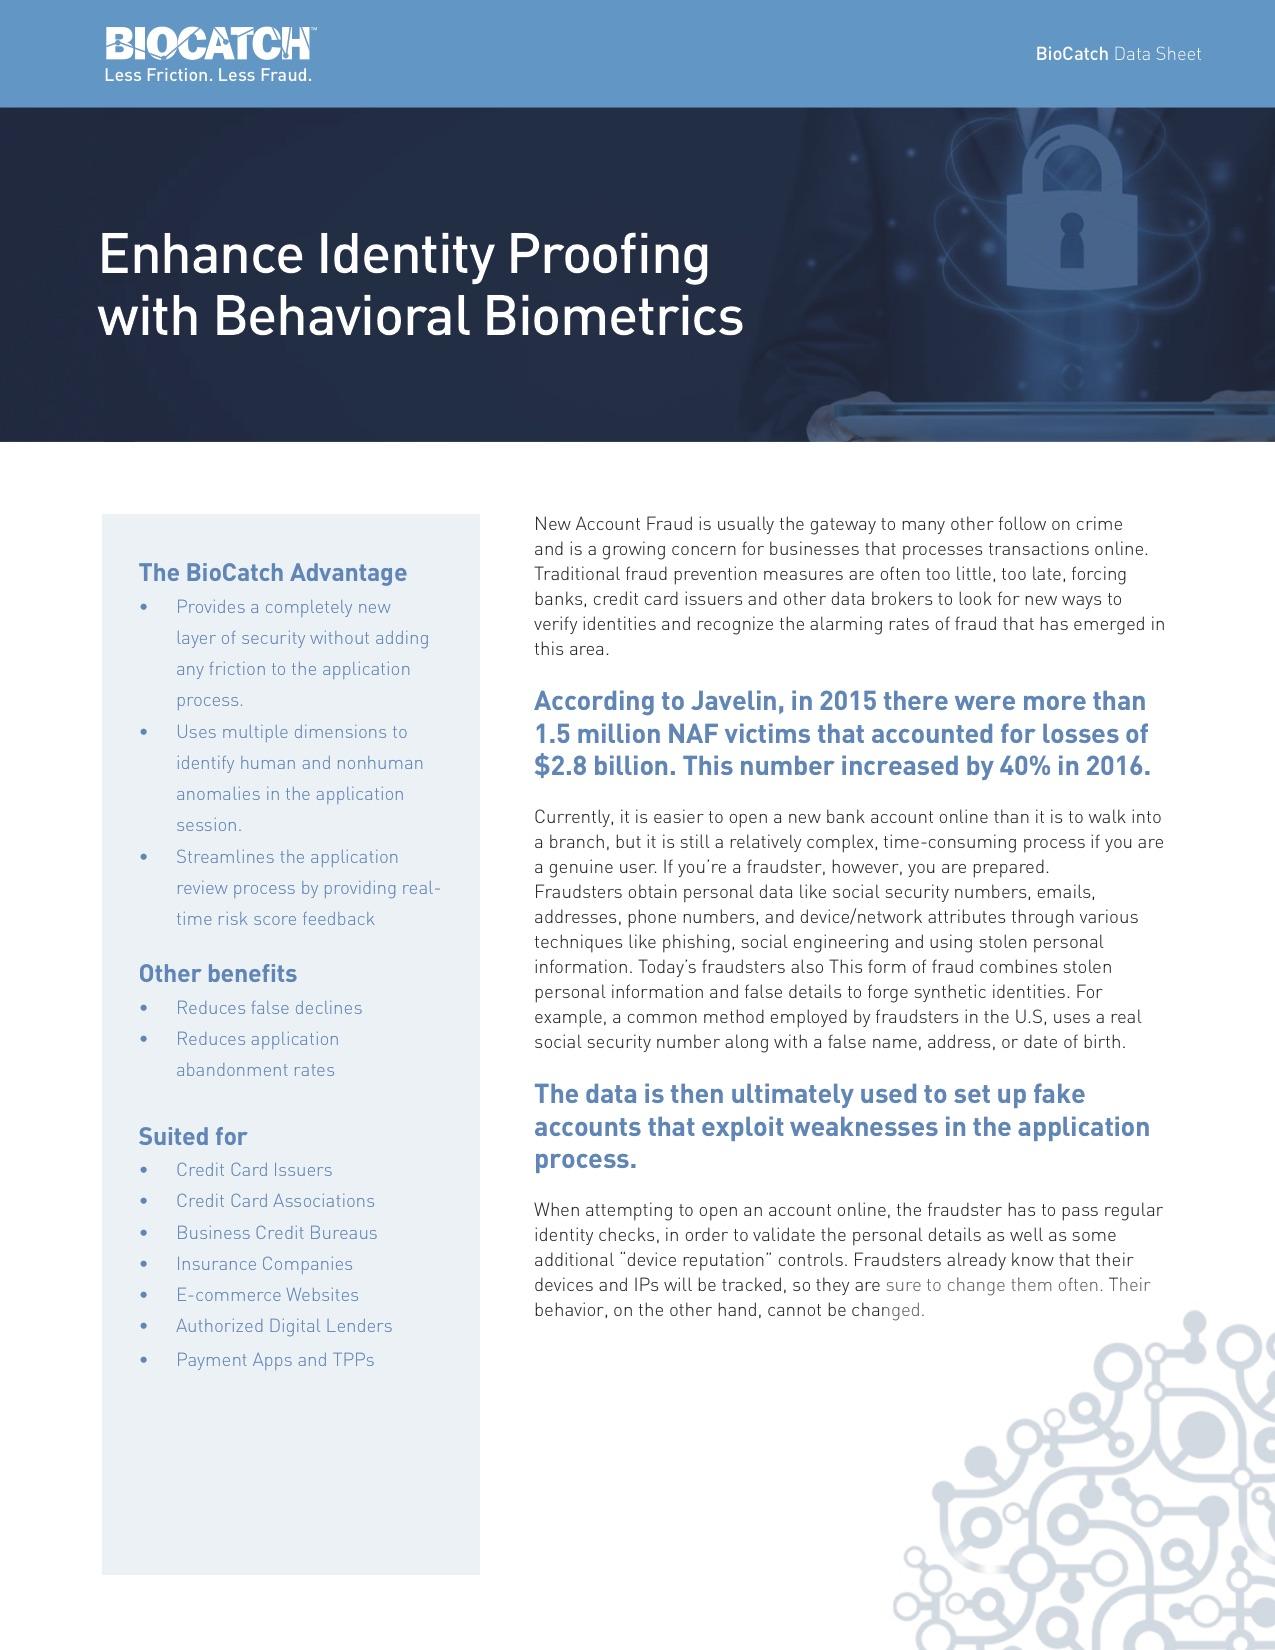 BioCatch_DS_New_Account_Fraud_20Sept2017_web_4-1.jpg